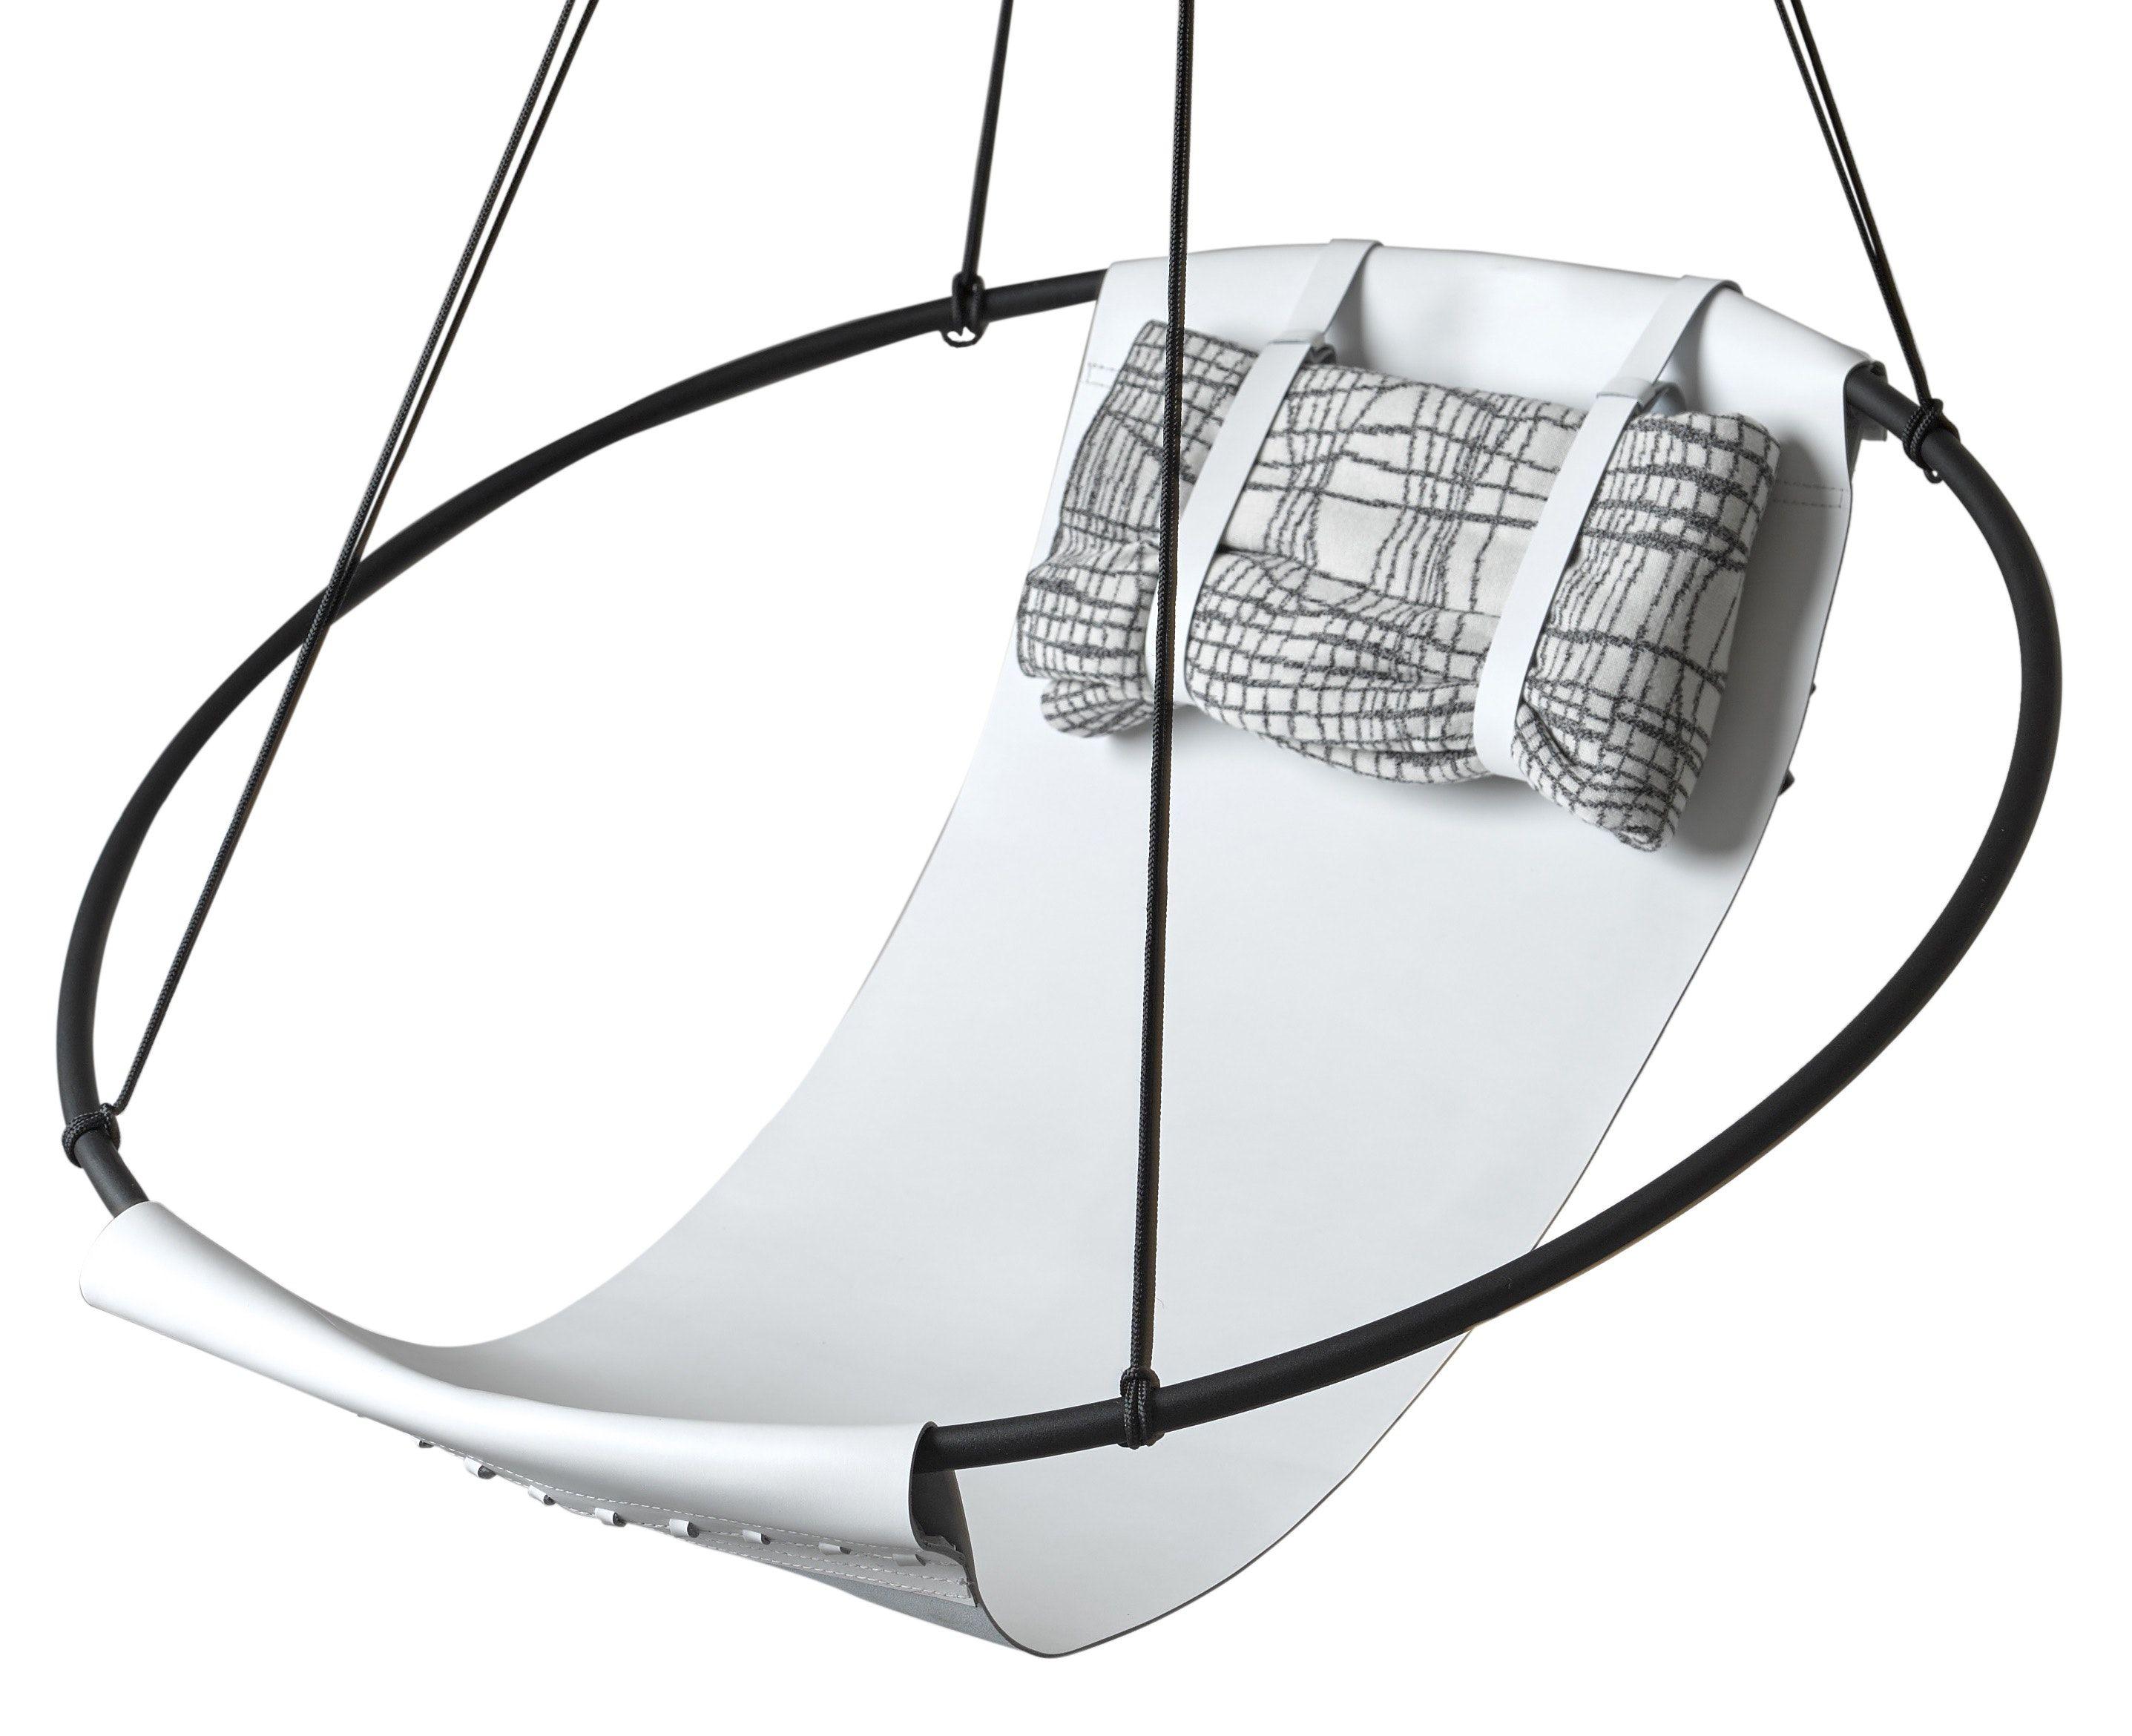 Sling Hanging Swing Chair White Hanging Swing Chair Swing - Modern-swing-pendant-light-by-monochro-design-studio